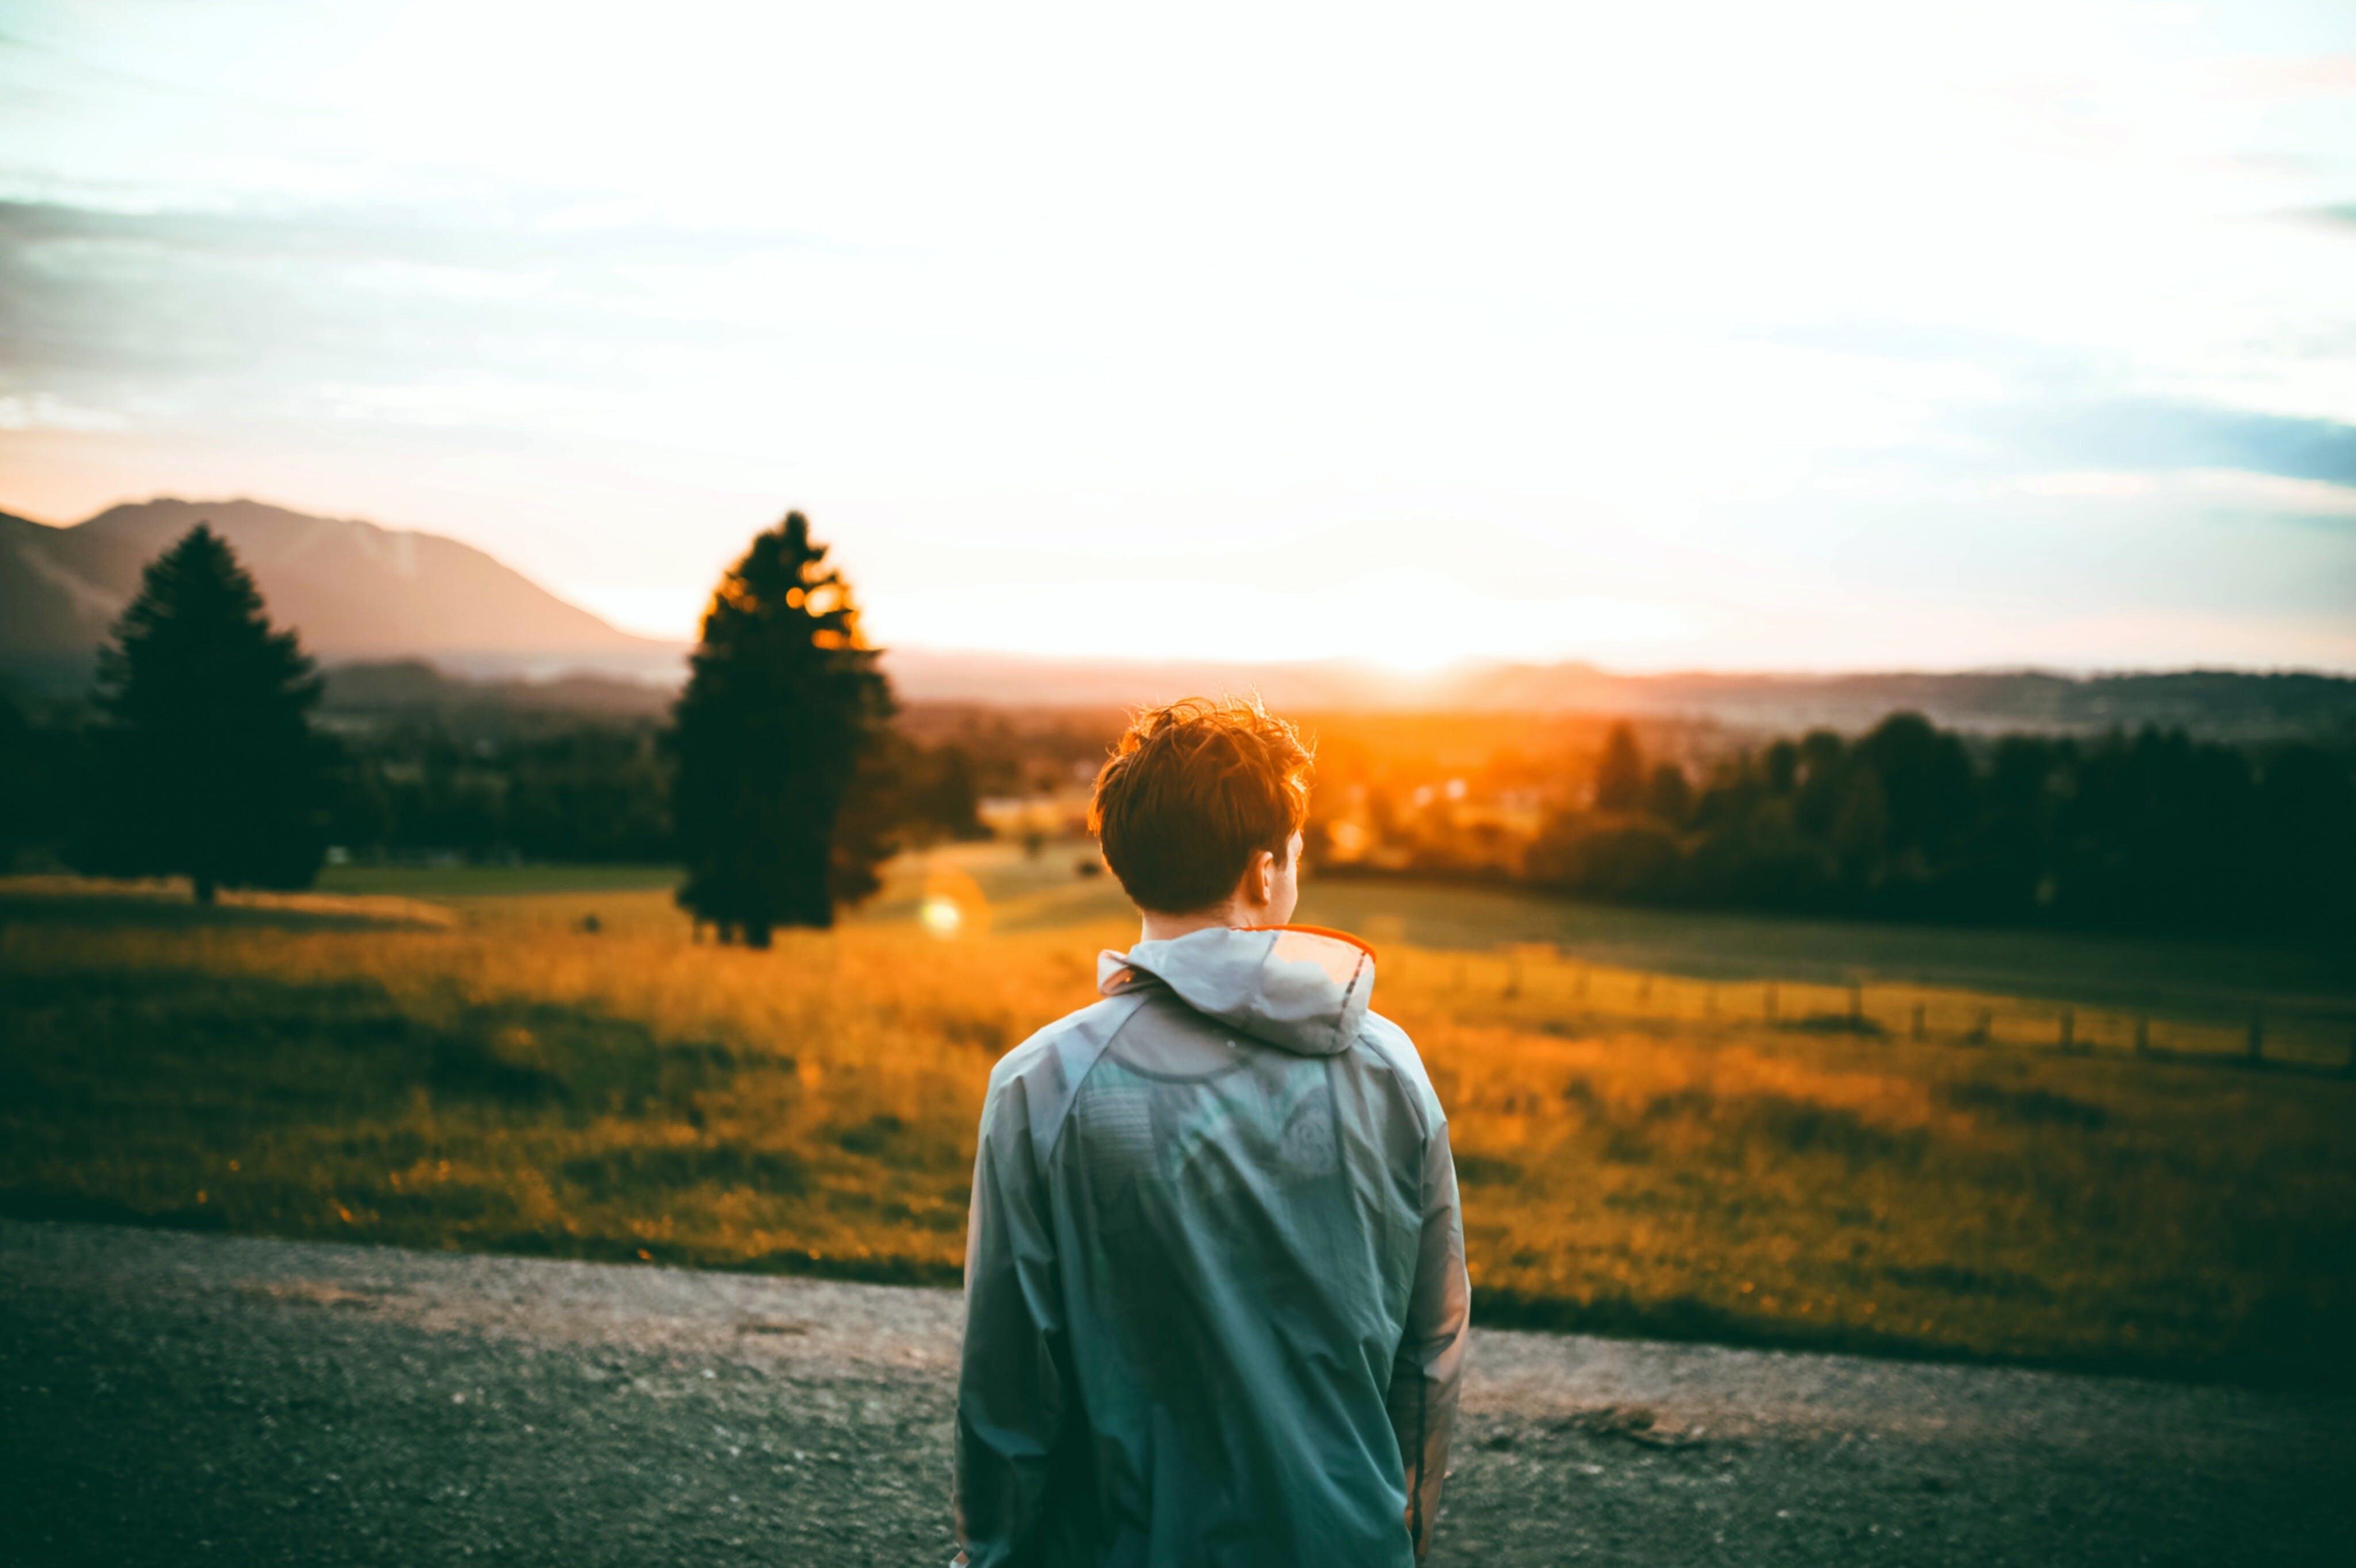 Man Standing Beside Road Facing Sun